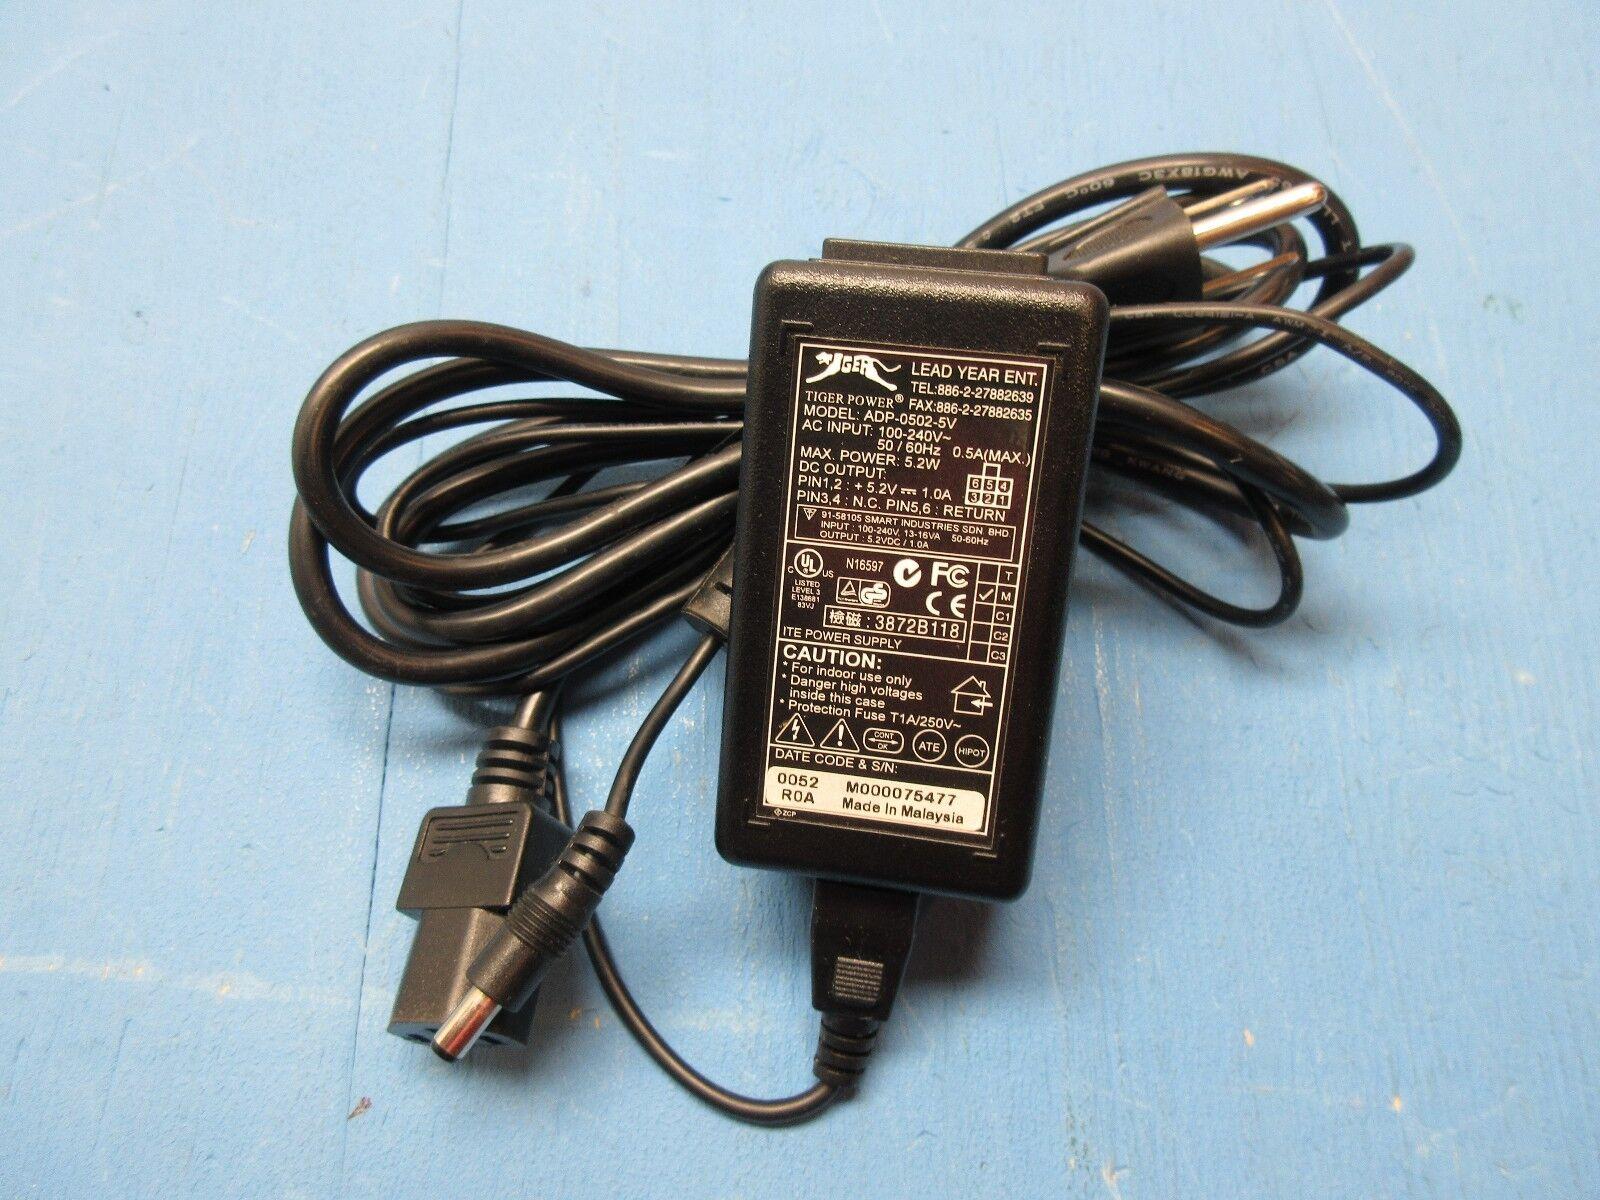 TIGER POWER ADP-0502-5V 5.2VDC POWER ADAPTER